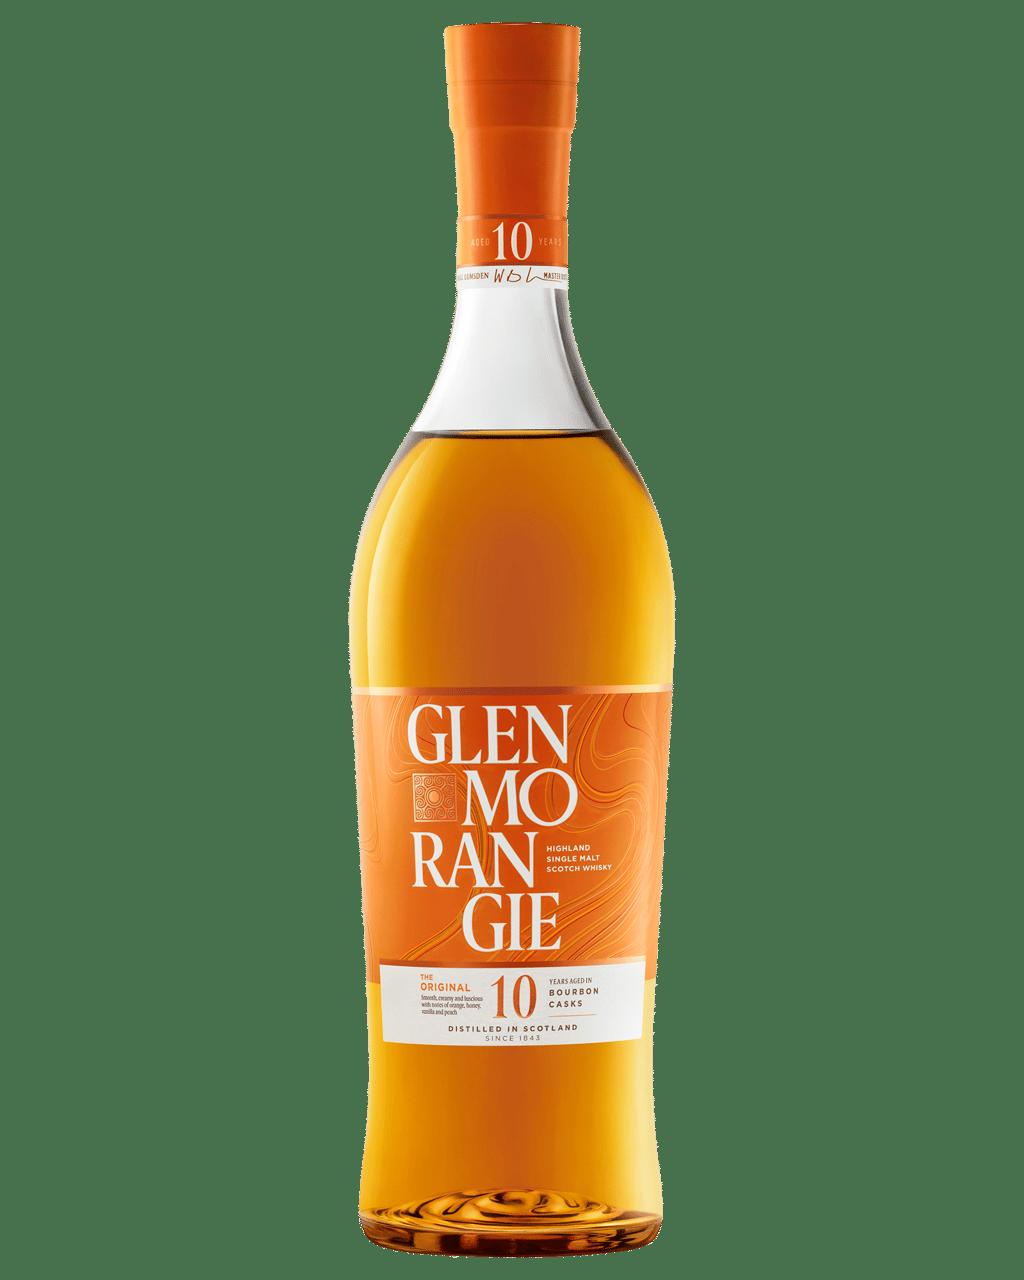 Buy Glenmorangie The Original Single Malt Scotch Whisky 10 Year Old 700mL | Dan Murphy's Delivers